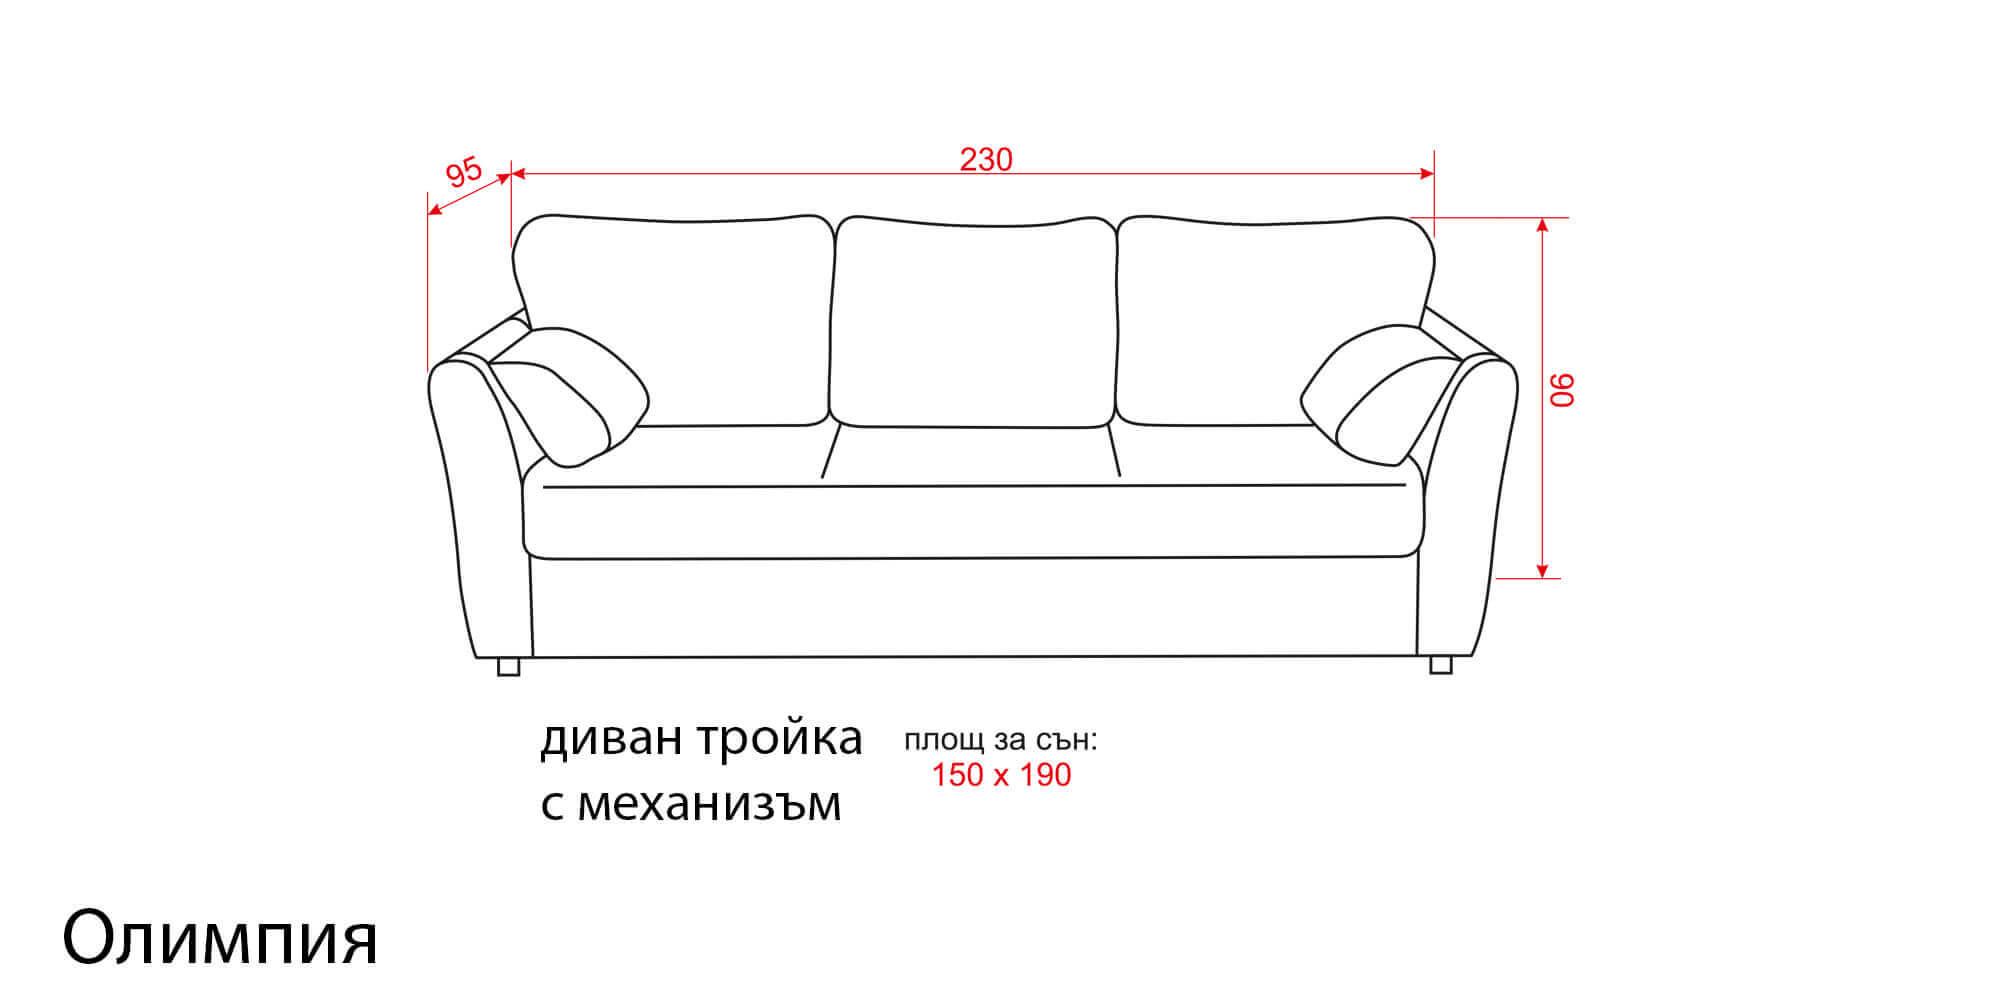 Размери Олимпия